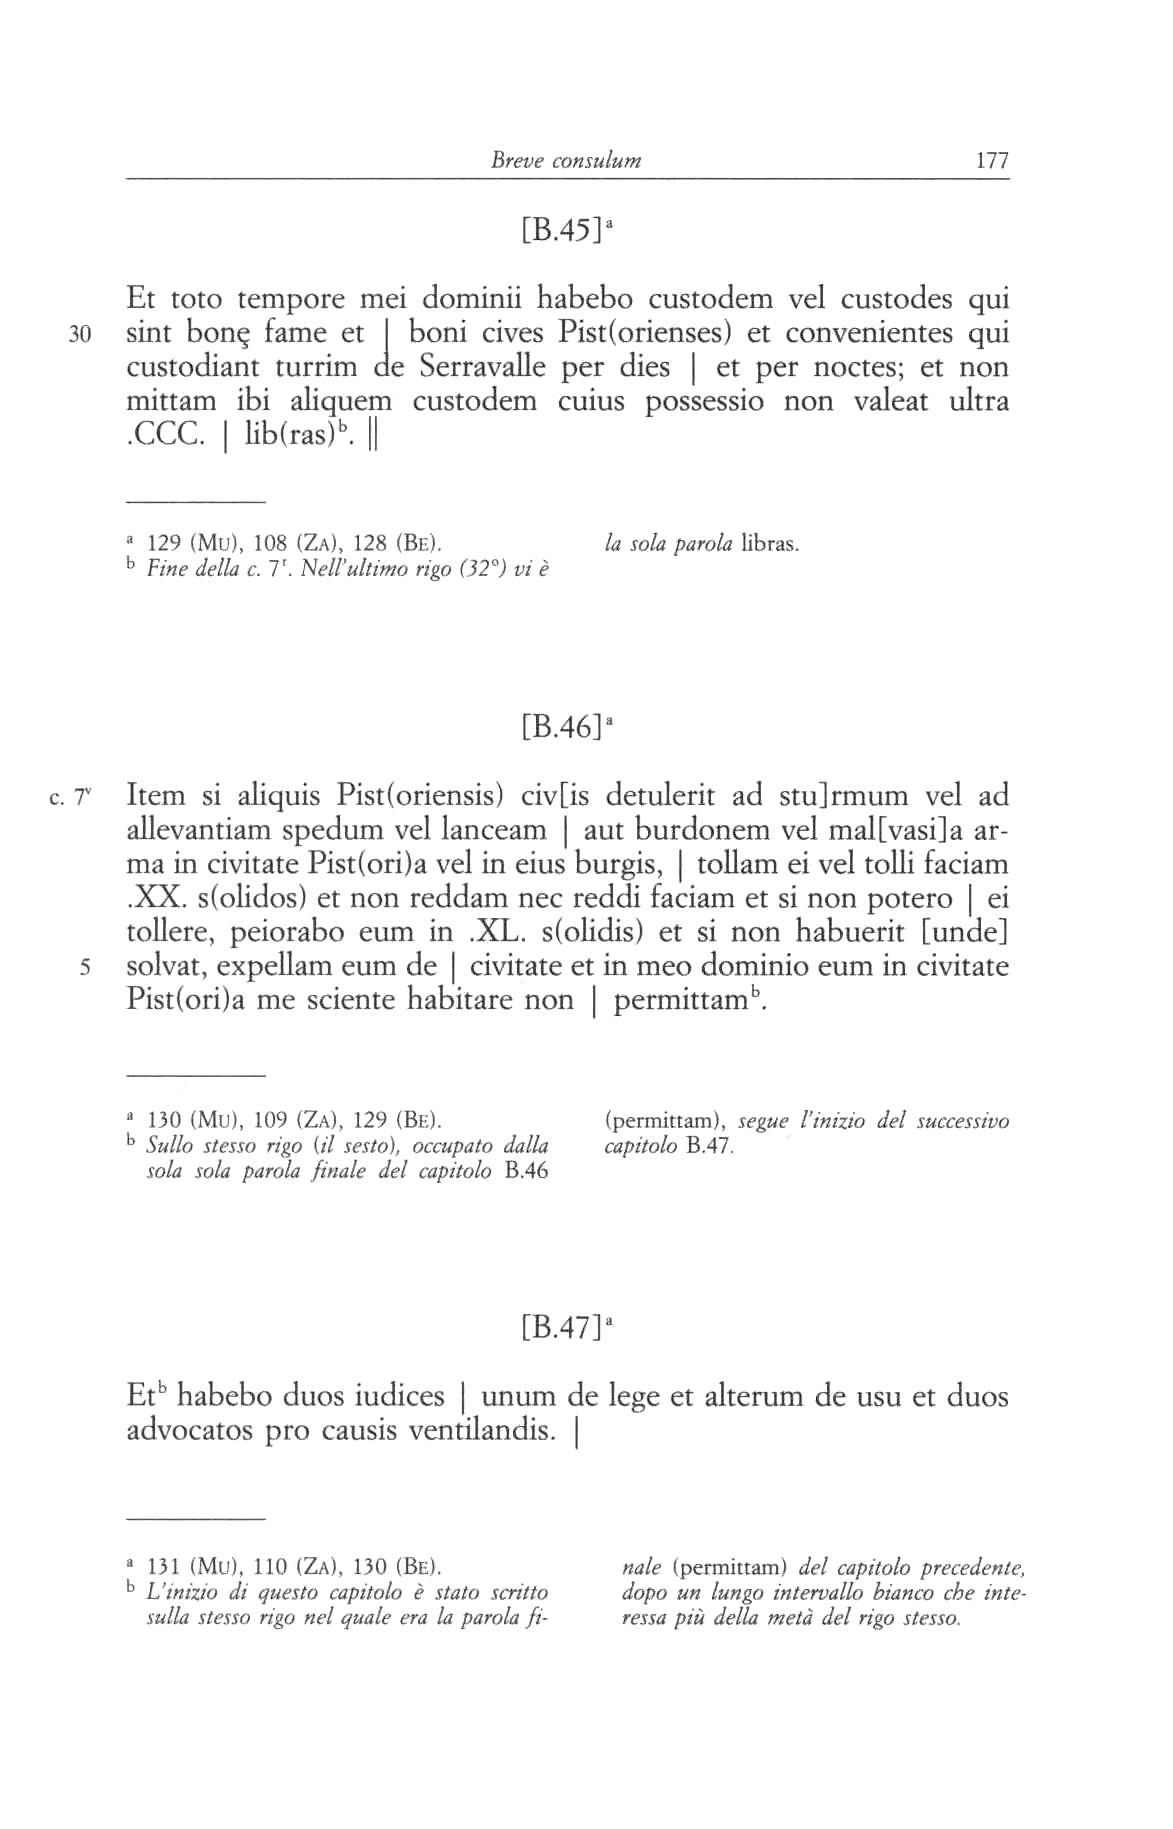 statuti pistoiesi del sec.XII 0177.jpg